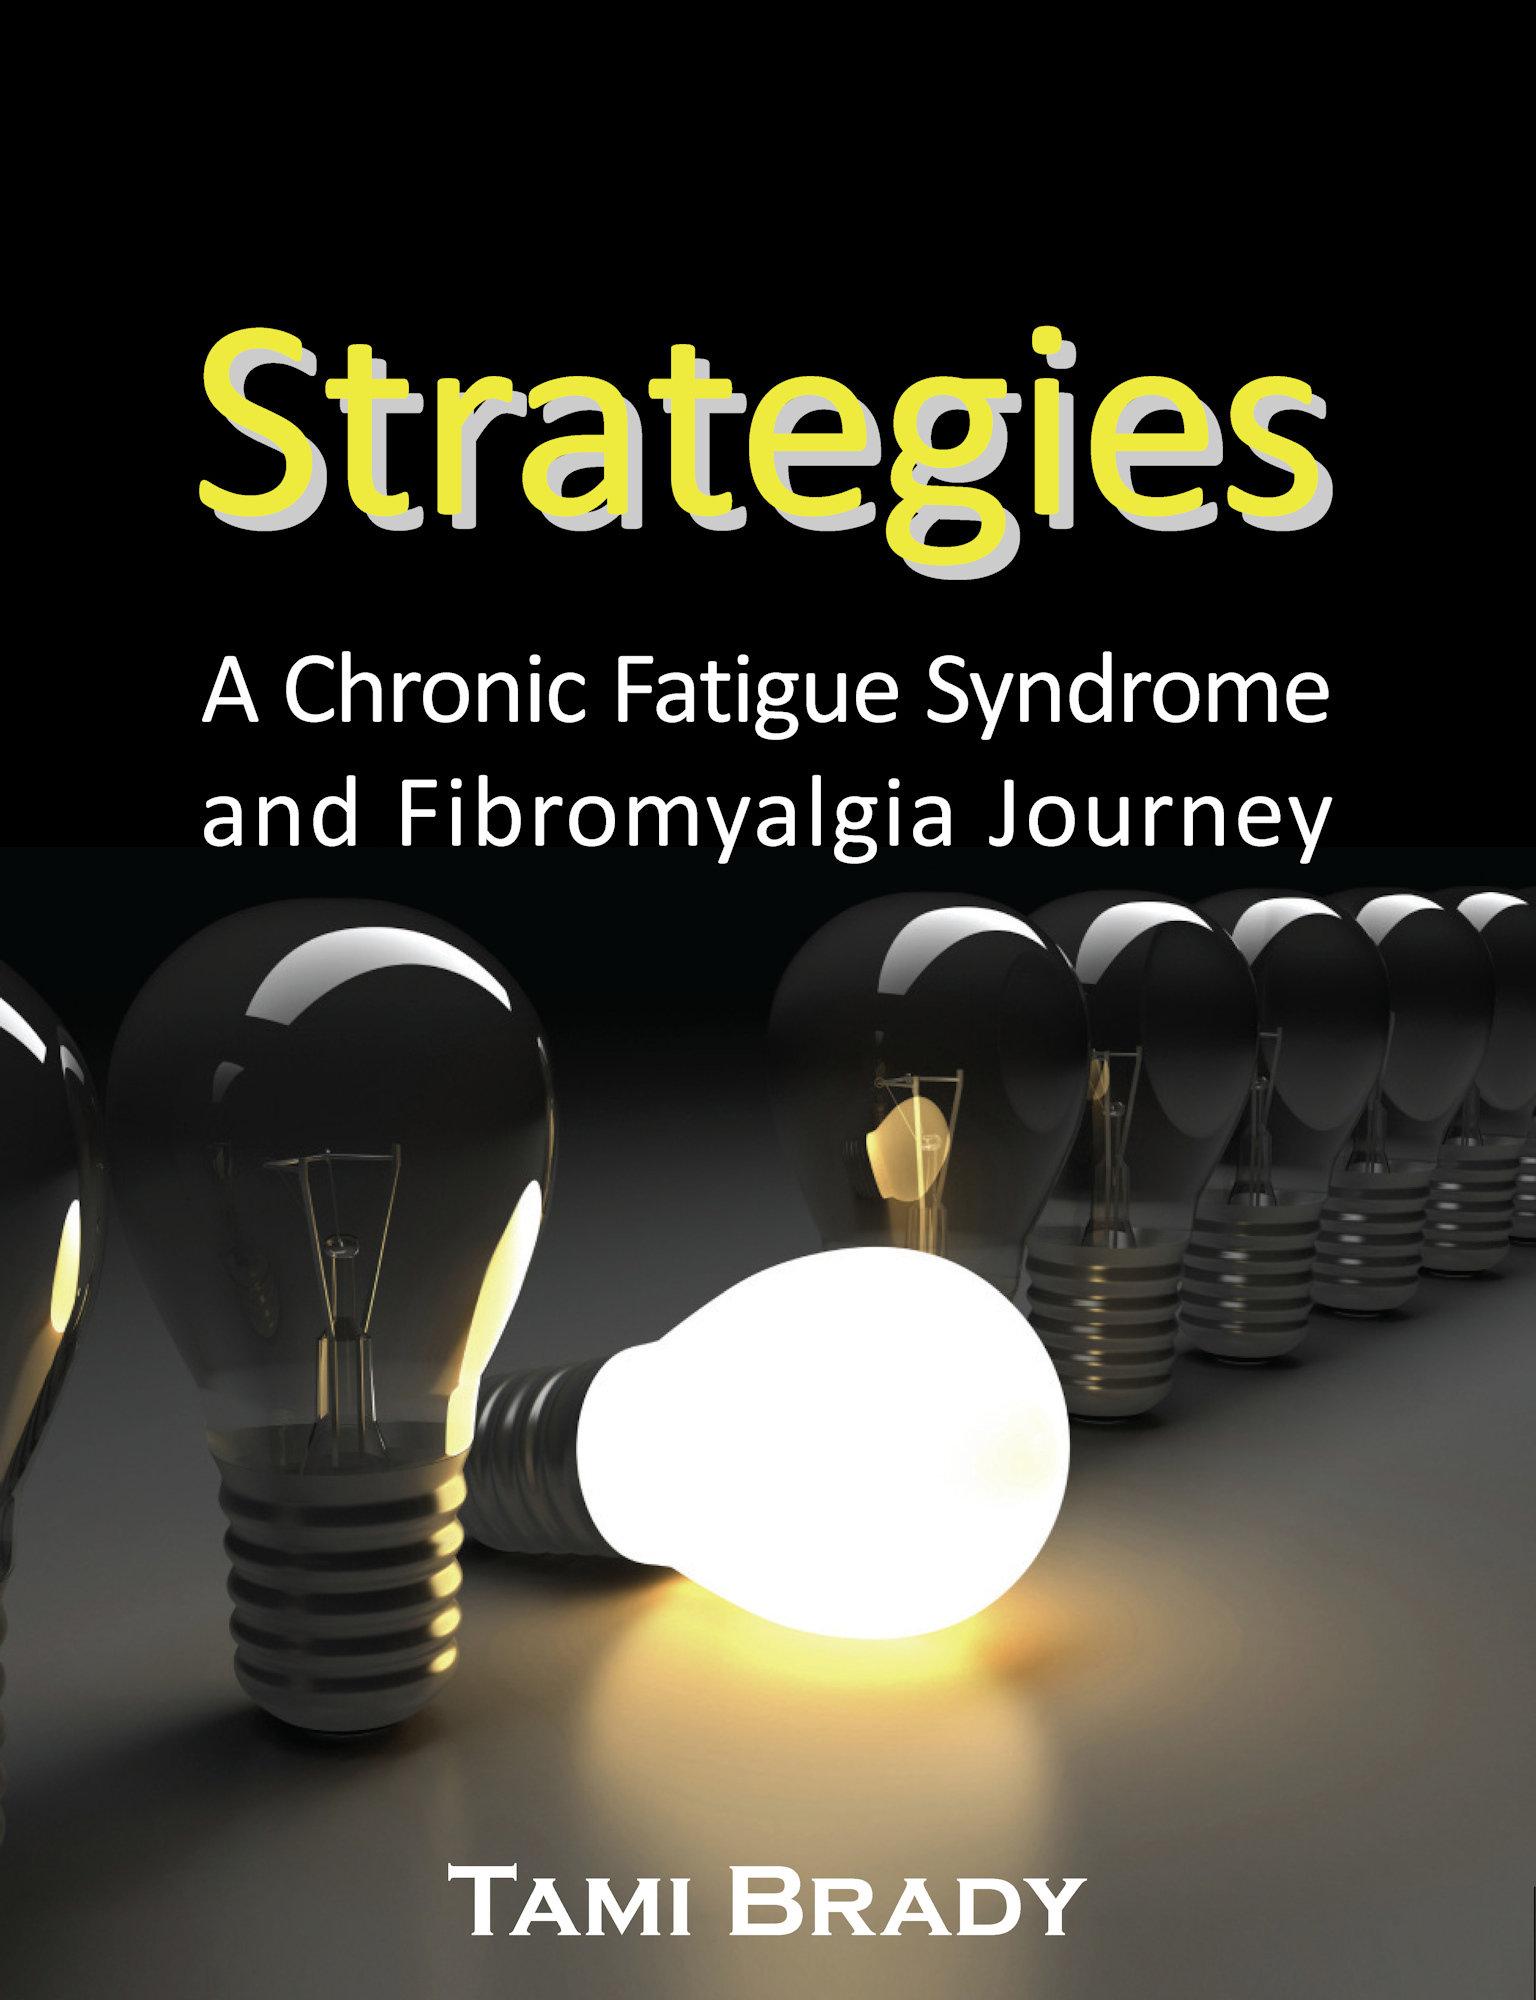 Strategies: A Chronic Fatigue Syndrome and Fibromyalgia Journey 978-1-932690-48-4